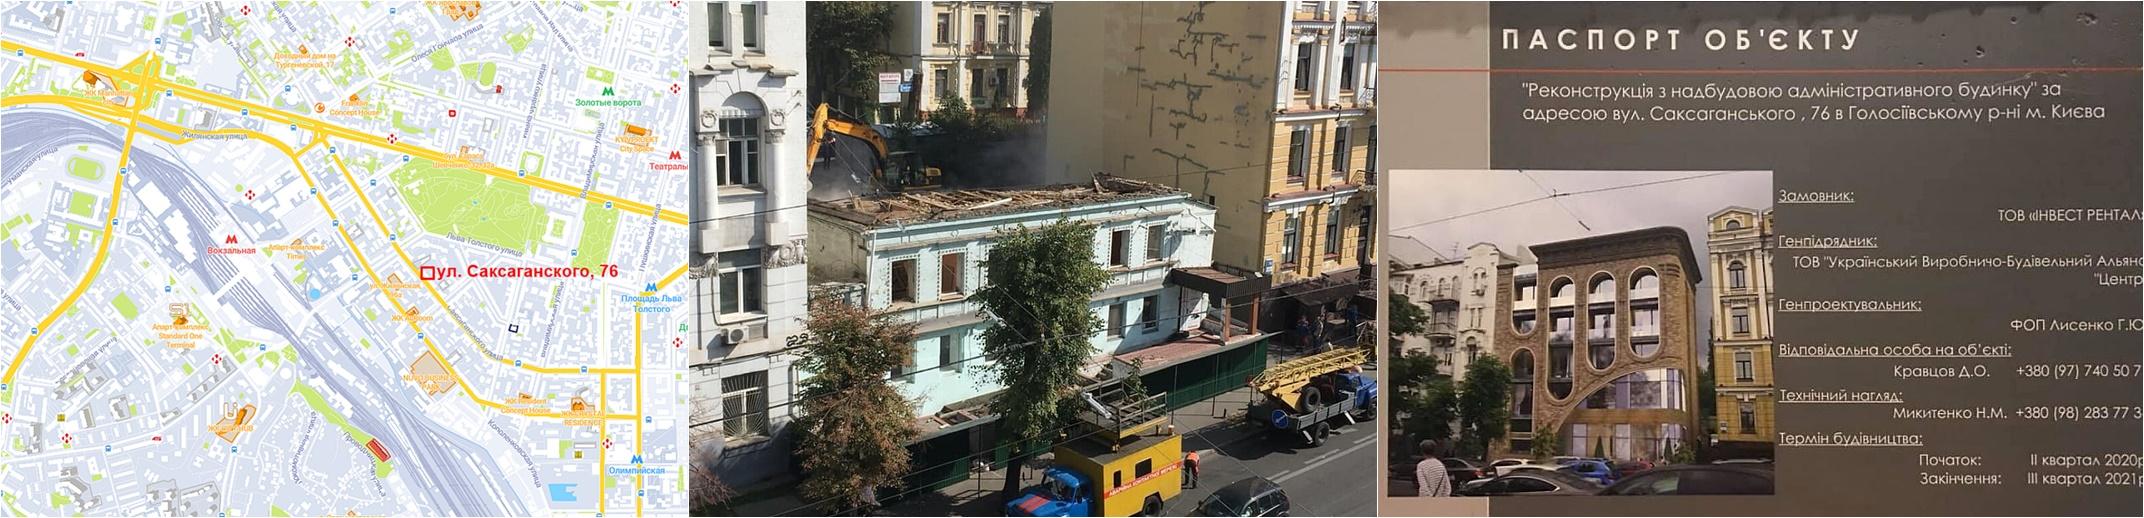 Проект реконструкции здания по ул. Саксаганского, 76 паспорт и на карте